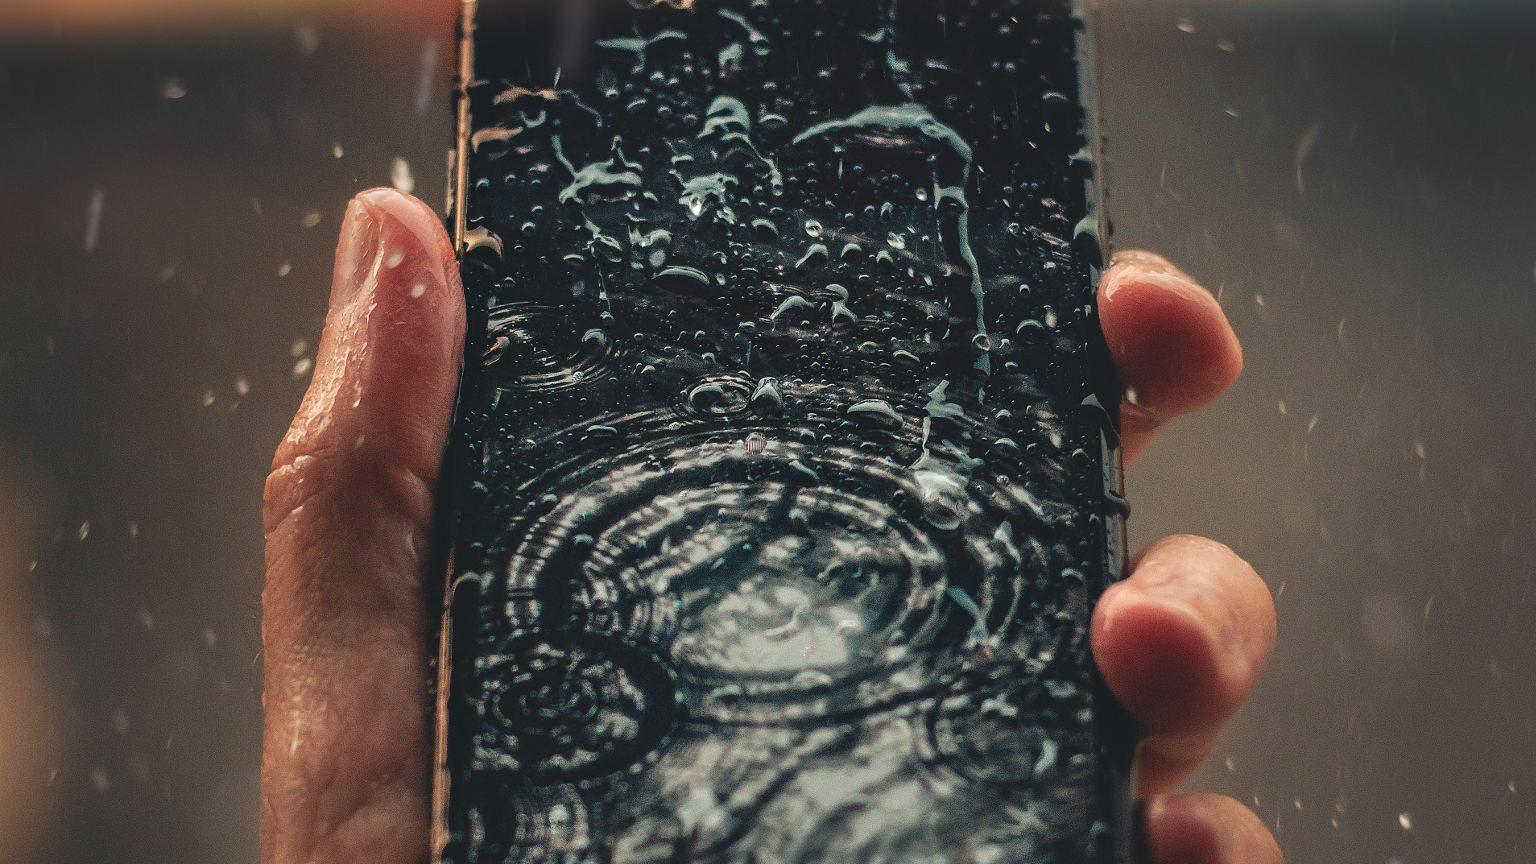 Phone in rain